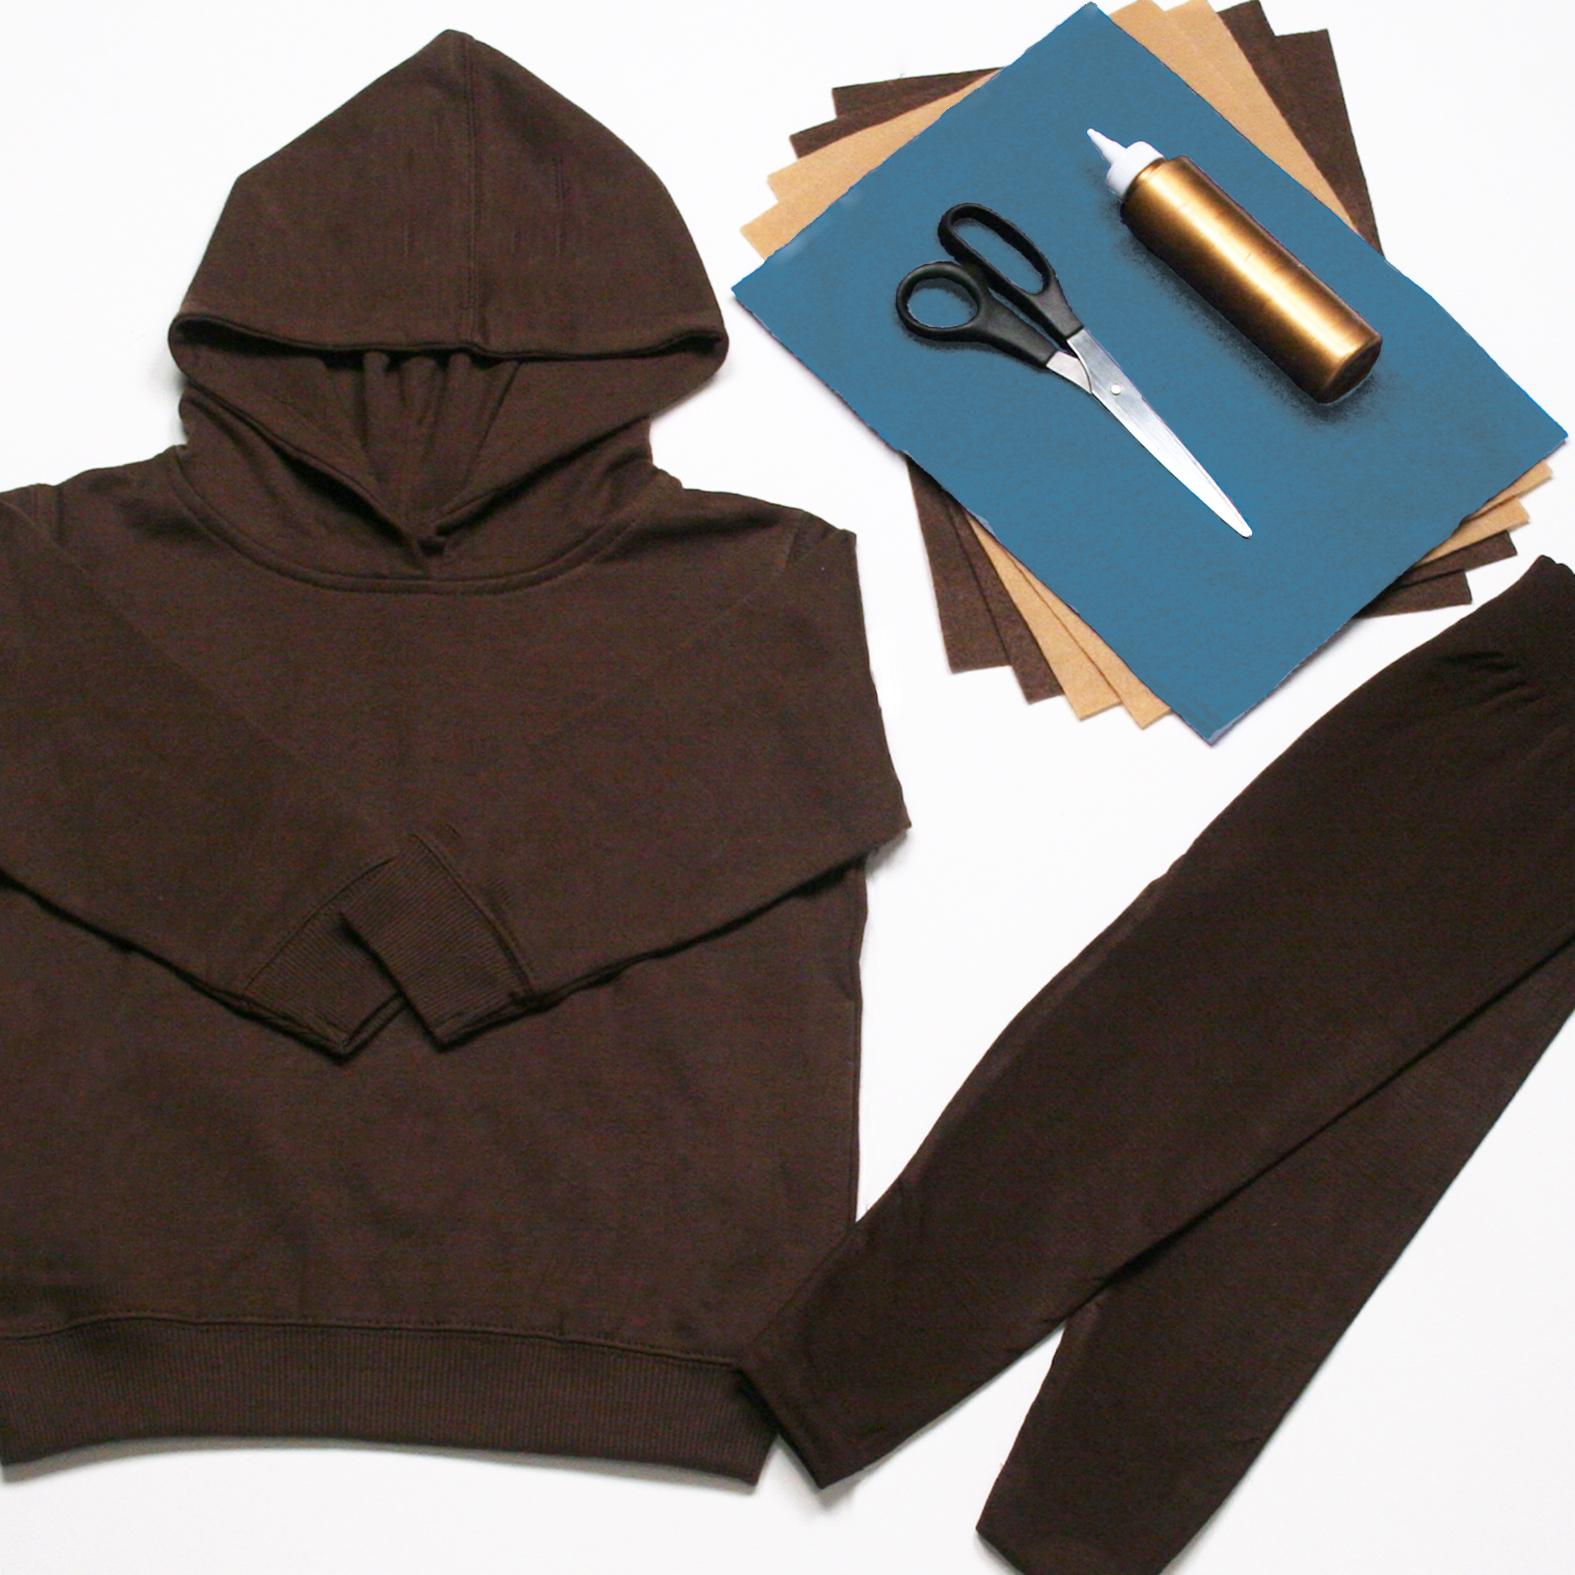 Teddy costume materials